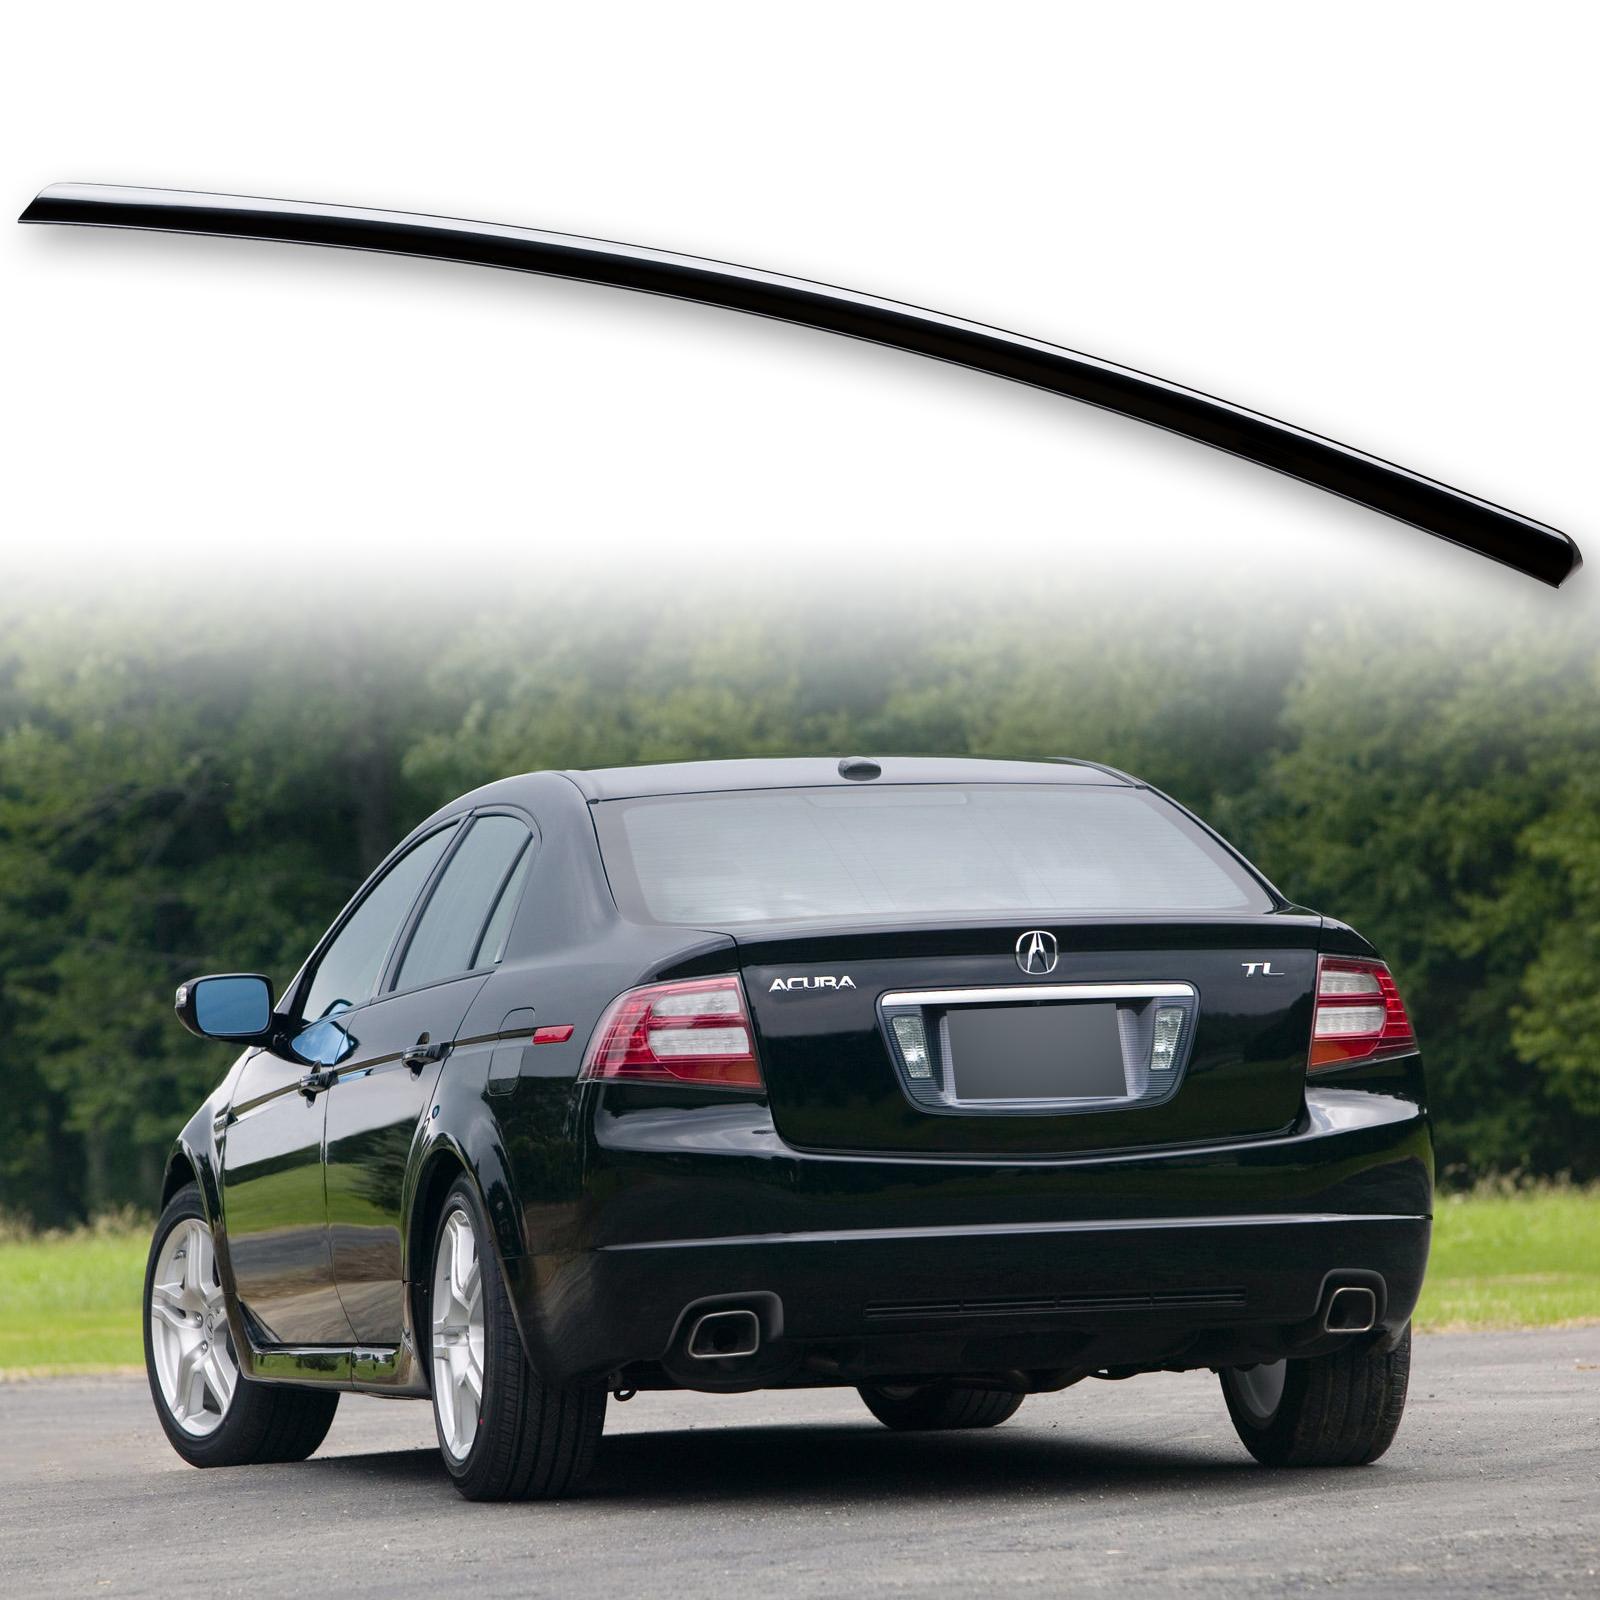 Fyralip Painted Trunk Lip Spoiler For 04 08 Acura Tl Nighthawk Black Pearl B 92p Ebay